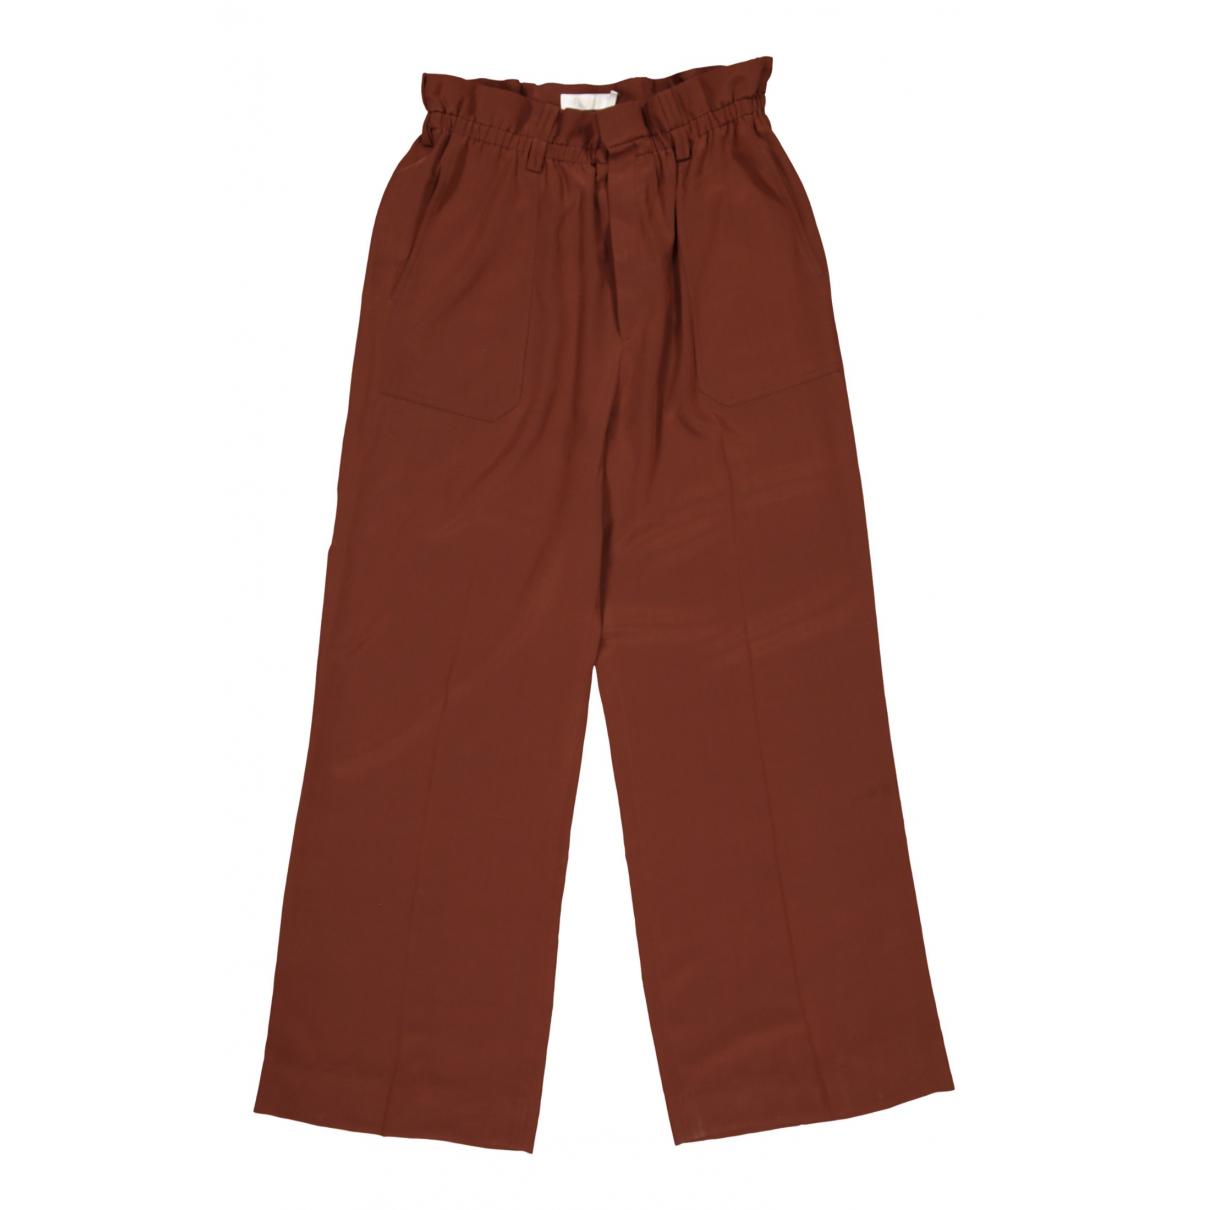 Chloé N Brown Silk Trousers for Women 42 FR